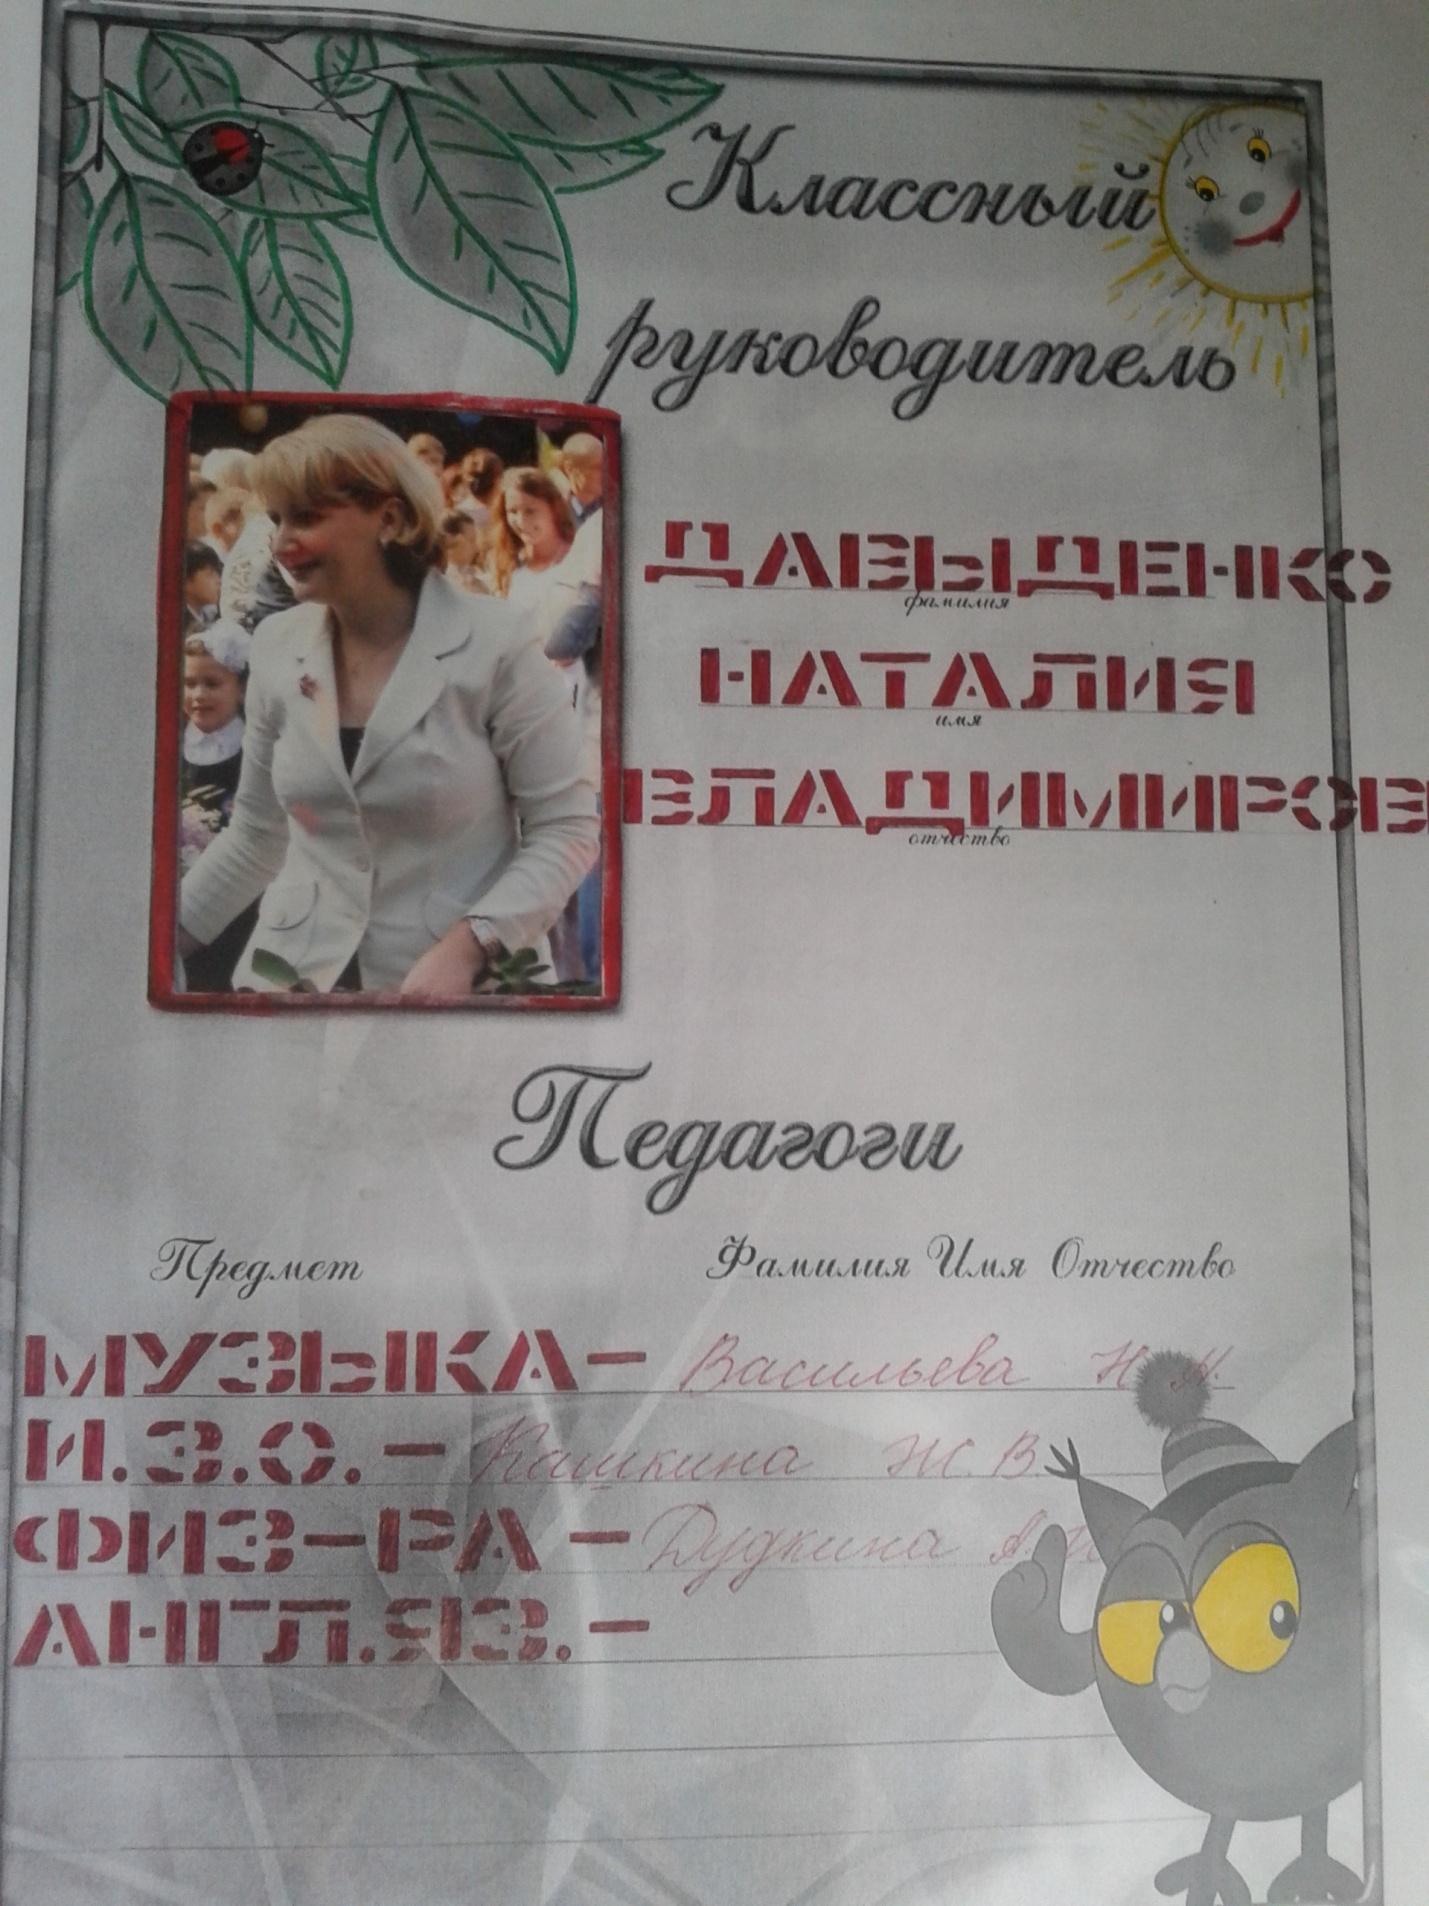 C:\Users\Vladimir\Pictures\2016-01-21 долматов портфолио\долматов портфолио 030.jpg